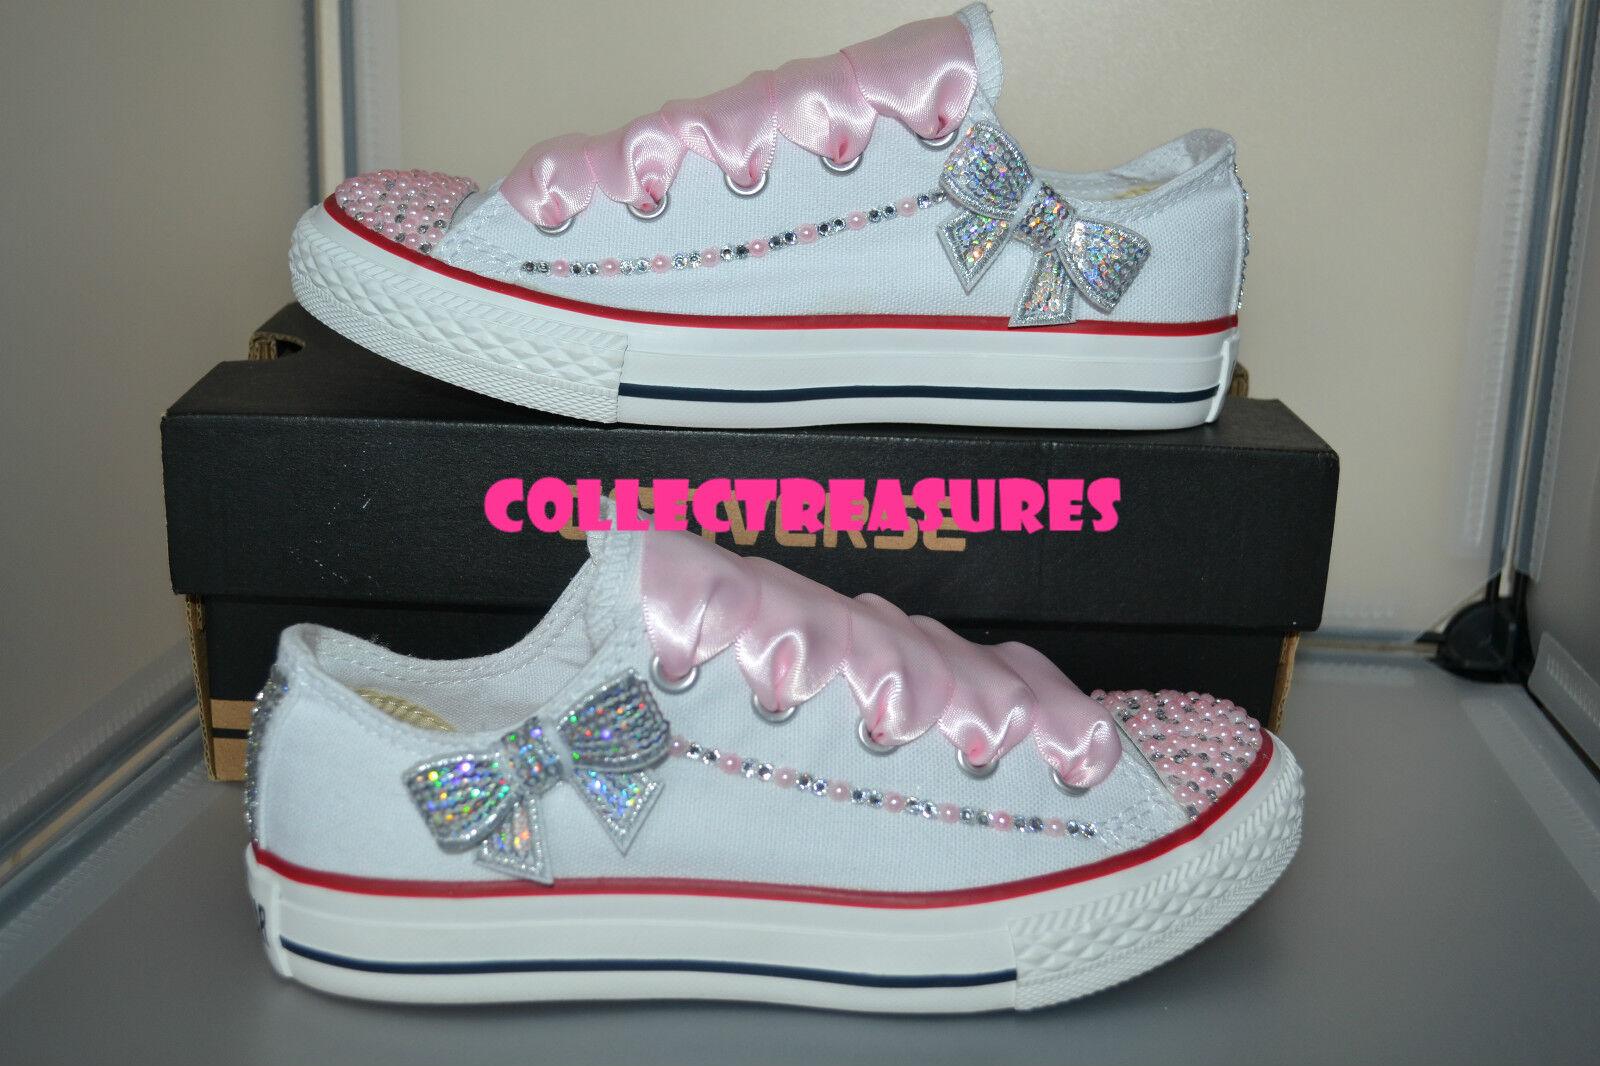 Custom Crystal Diamante Bling UK Wedding Weiß Converse Größe UK Bling 3 4 5 6 7 8 9 Pink 99ad9e